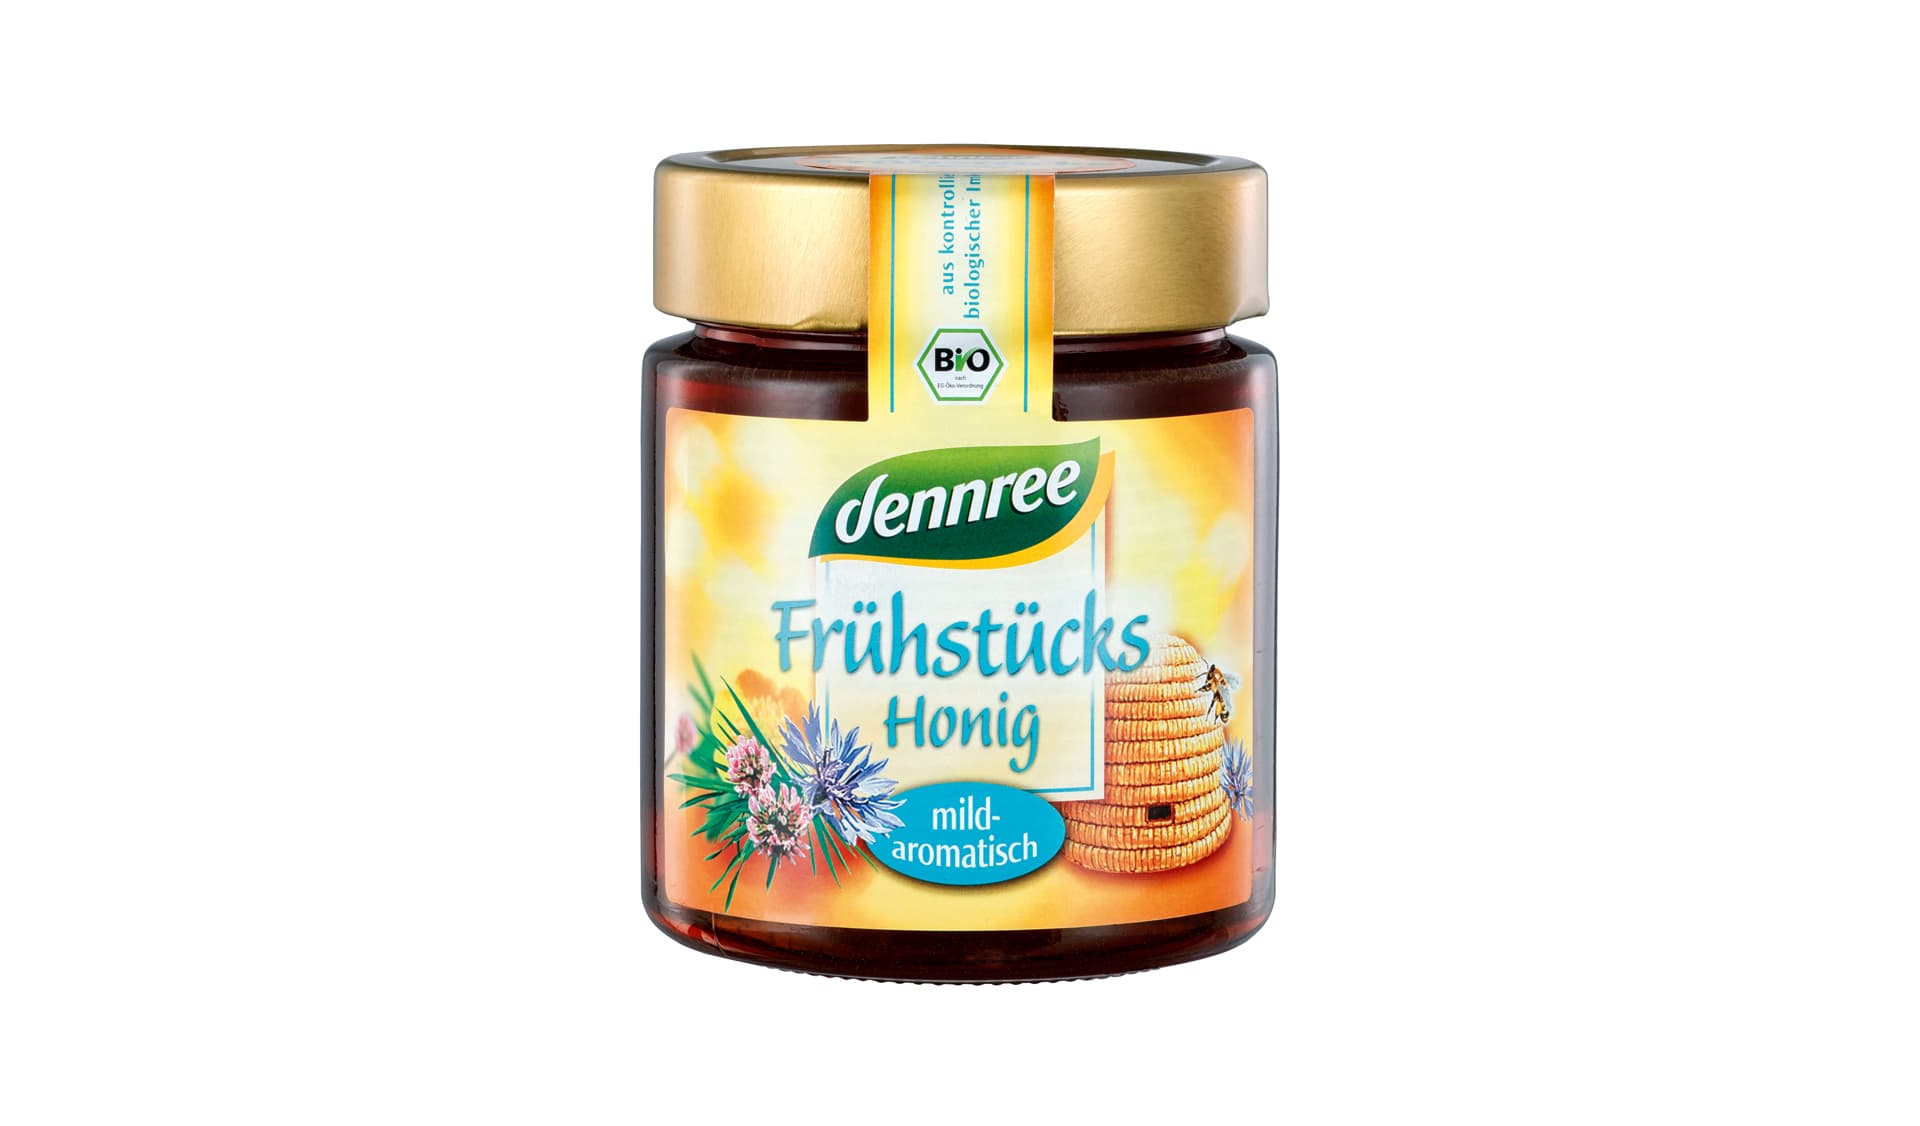 Dennree Frühstückshonig (www.dennree.de)